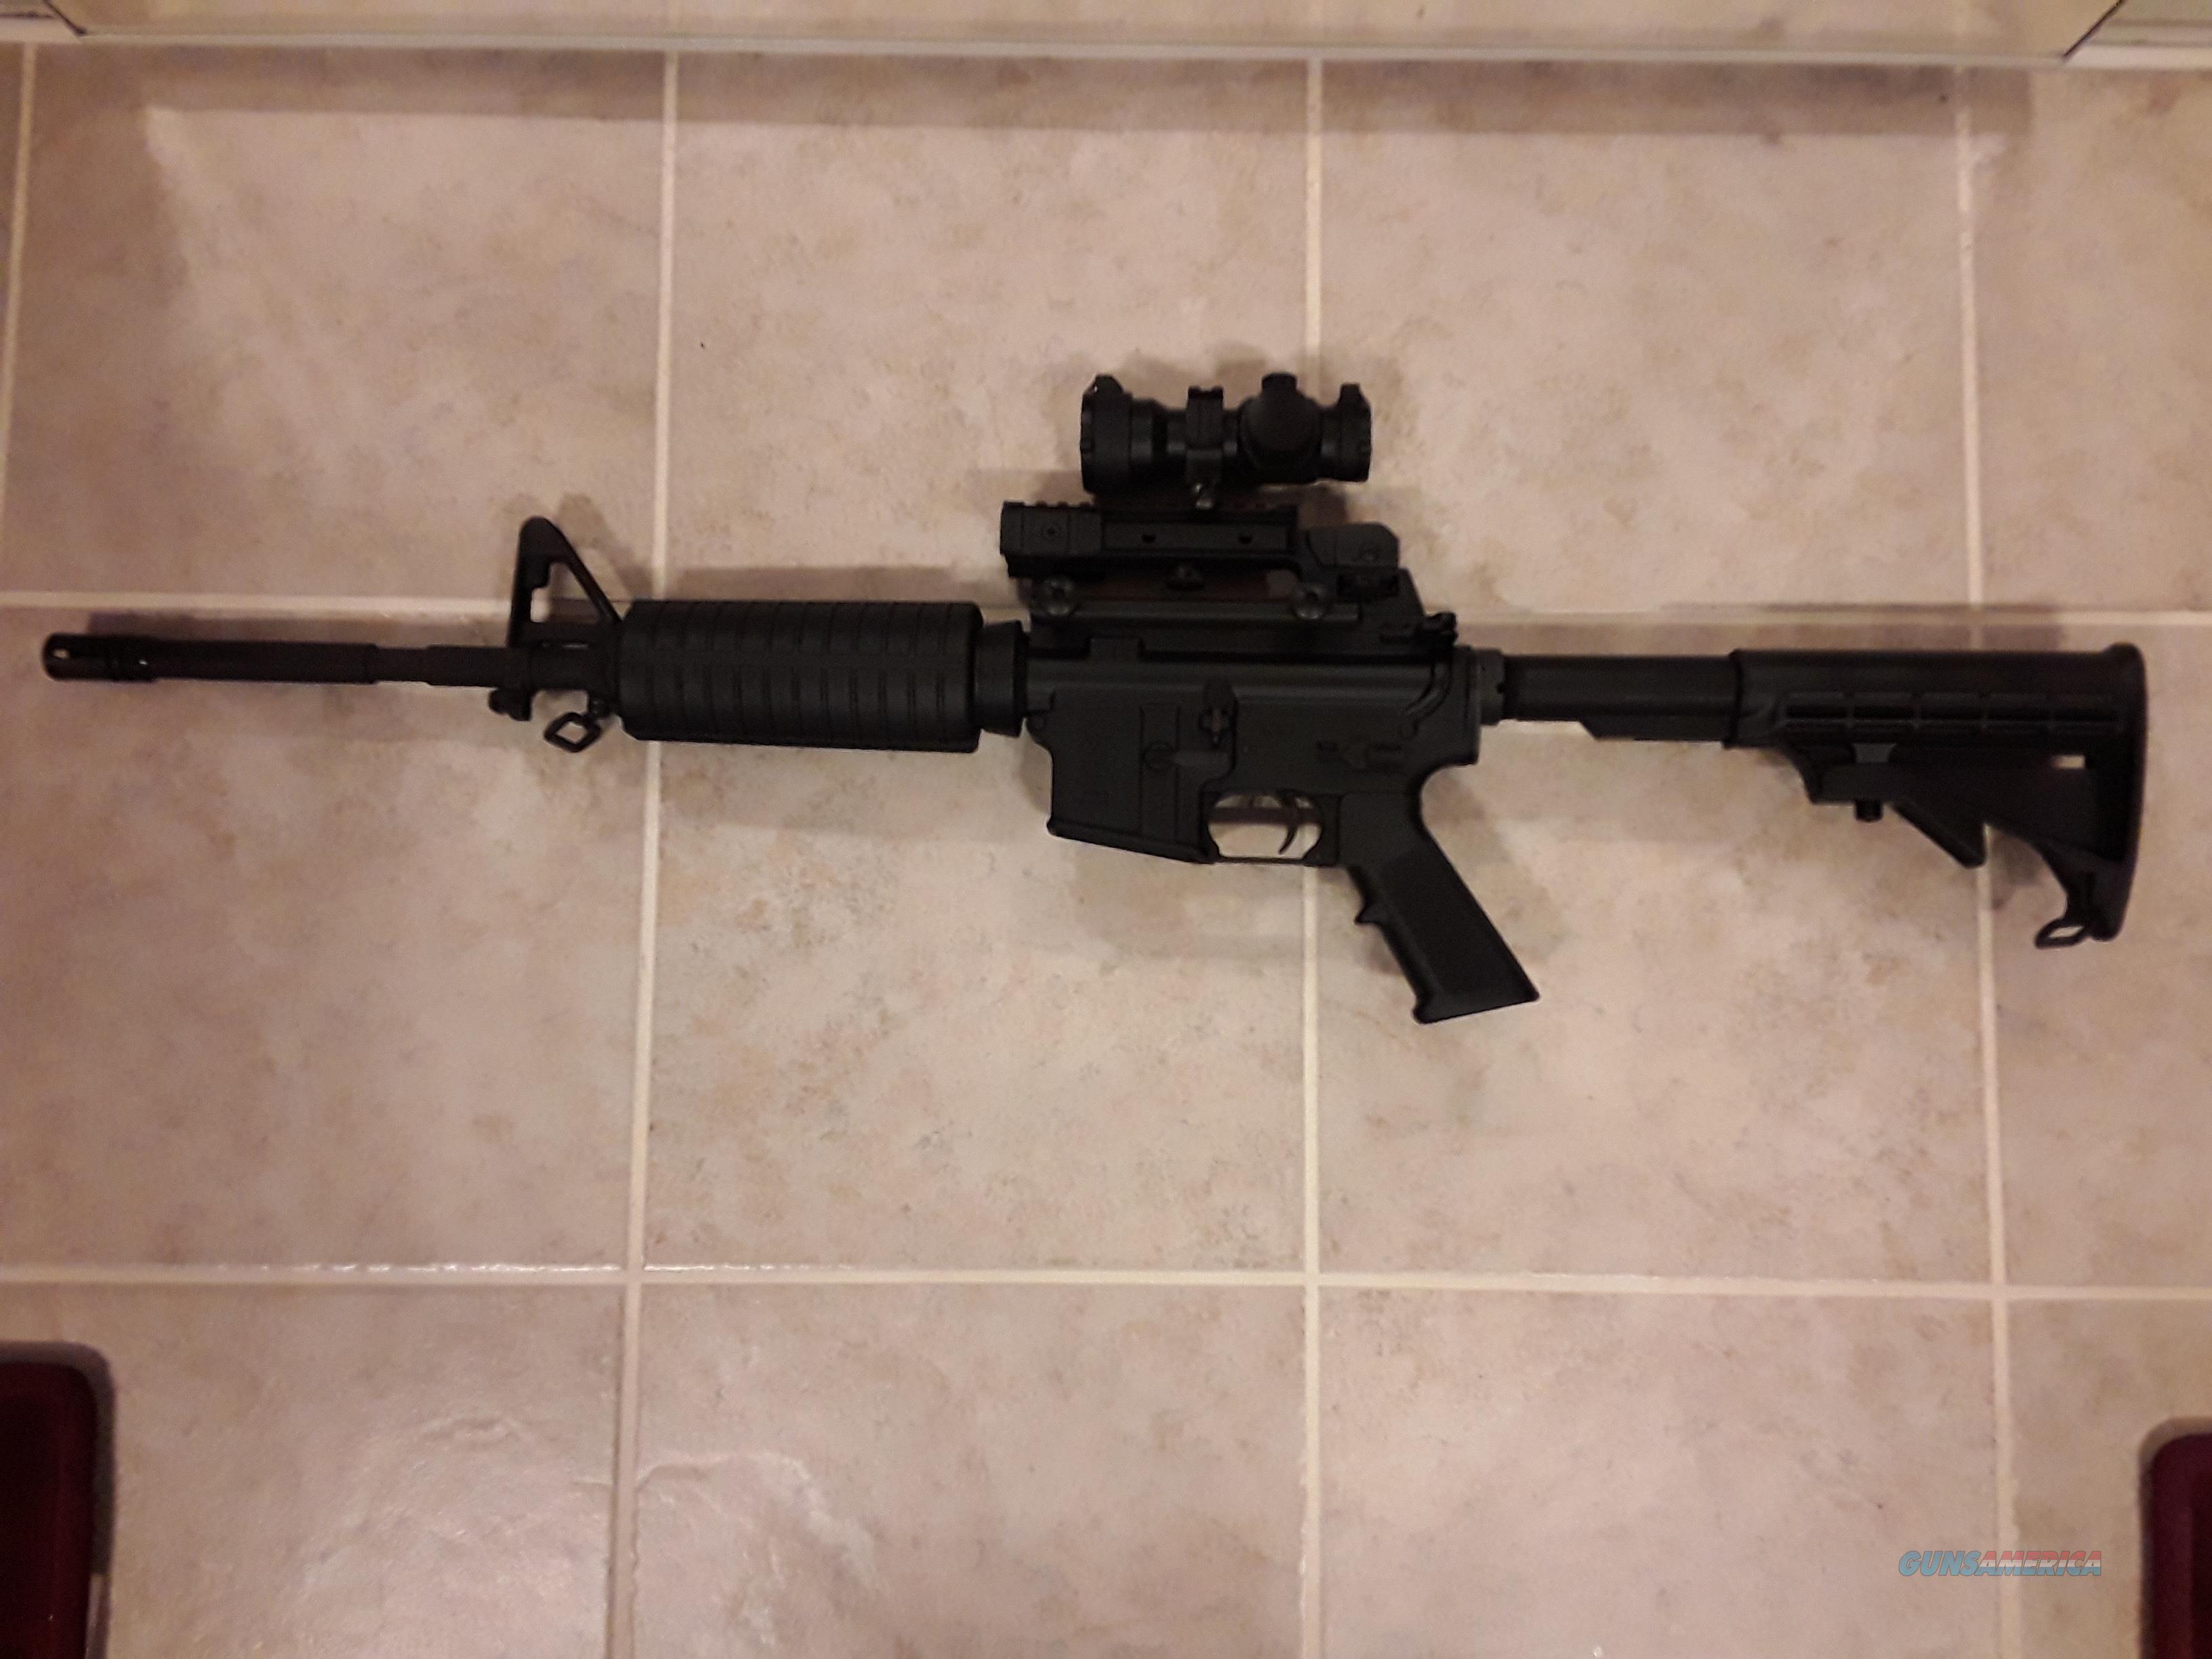 Lauer Custom Weaponry LE AR15 CHROMED BARREL.  Guns > Rifles > AR-15 Rifles - Small Manufacturers > Complete Rifle